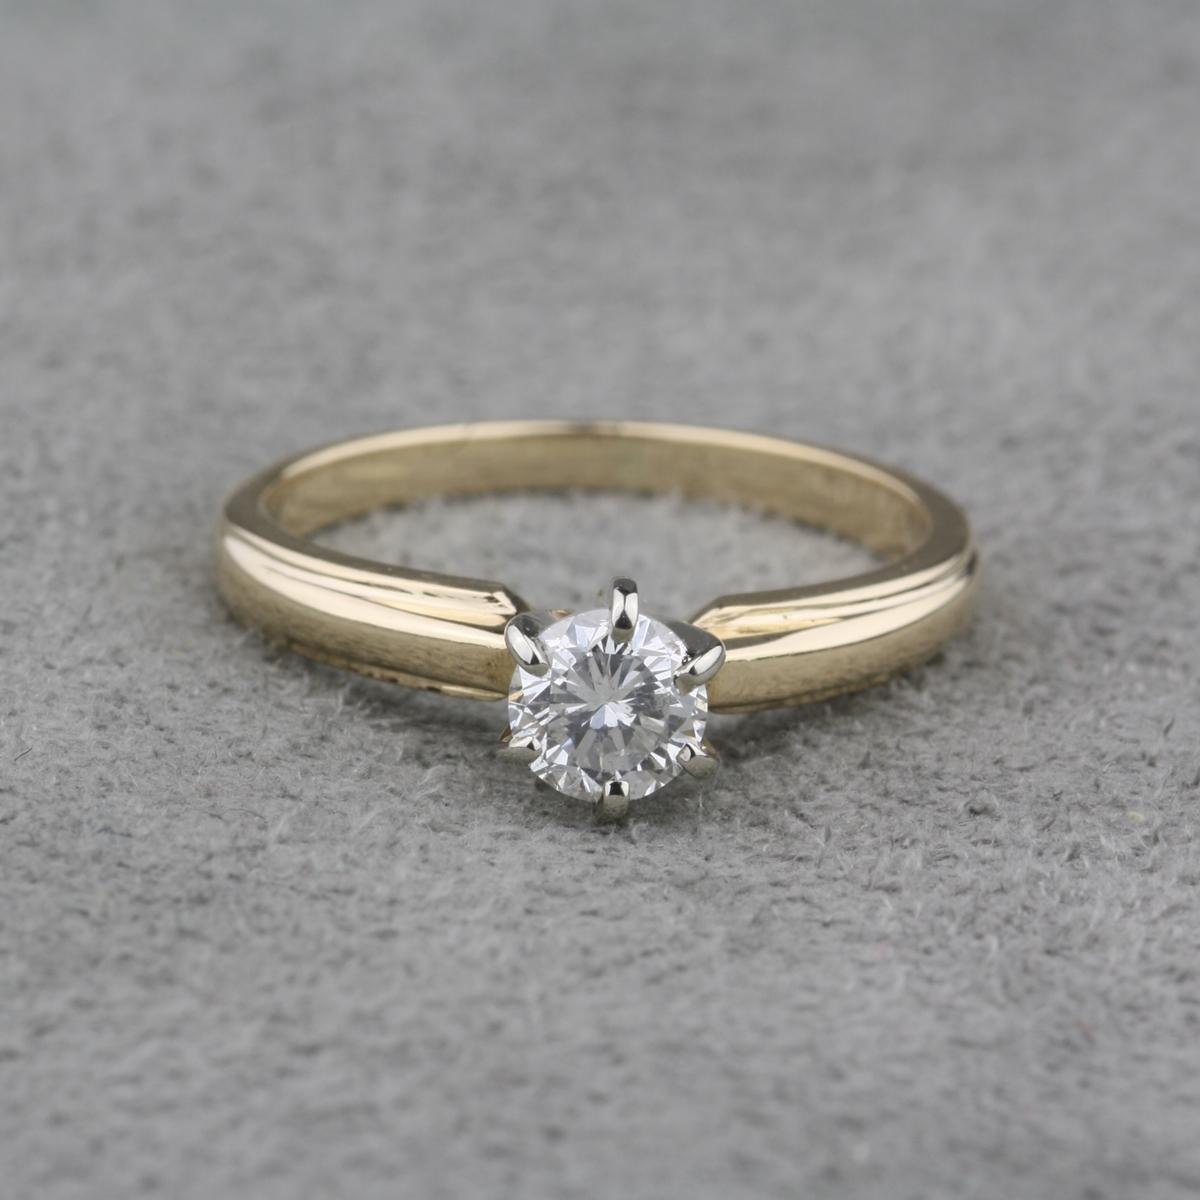 Preowned Diamond Engagement Ring. Unc Rings. Enhancer Rings. Survival Wedding Rings. Blessing Wedding Rings. Multi Metal Wedding Rings. Pink Sapphire Side Stone Wedding Rings. Heavy Rings. Egg Shaped Engagement Rings